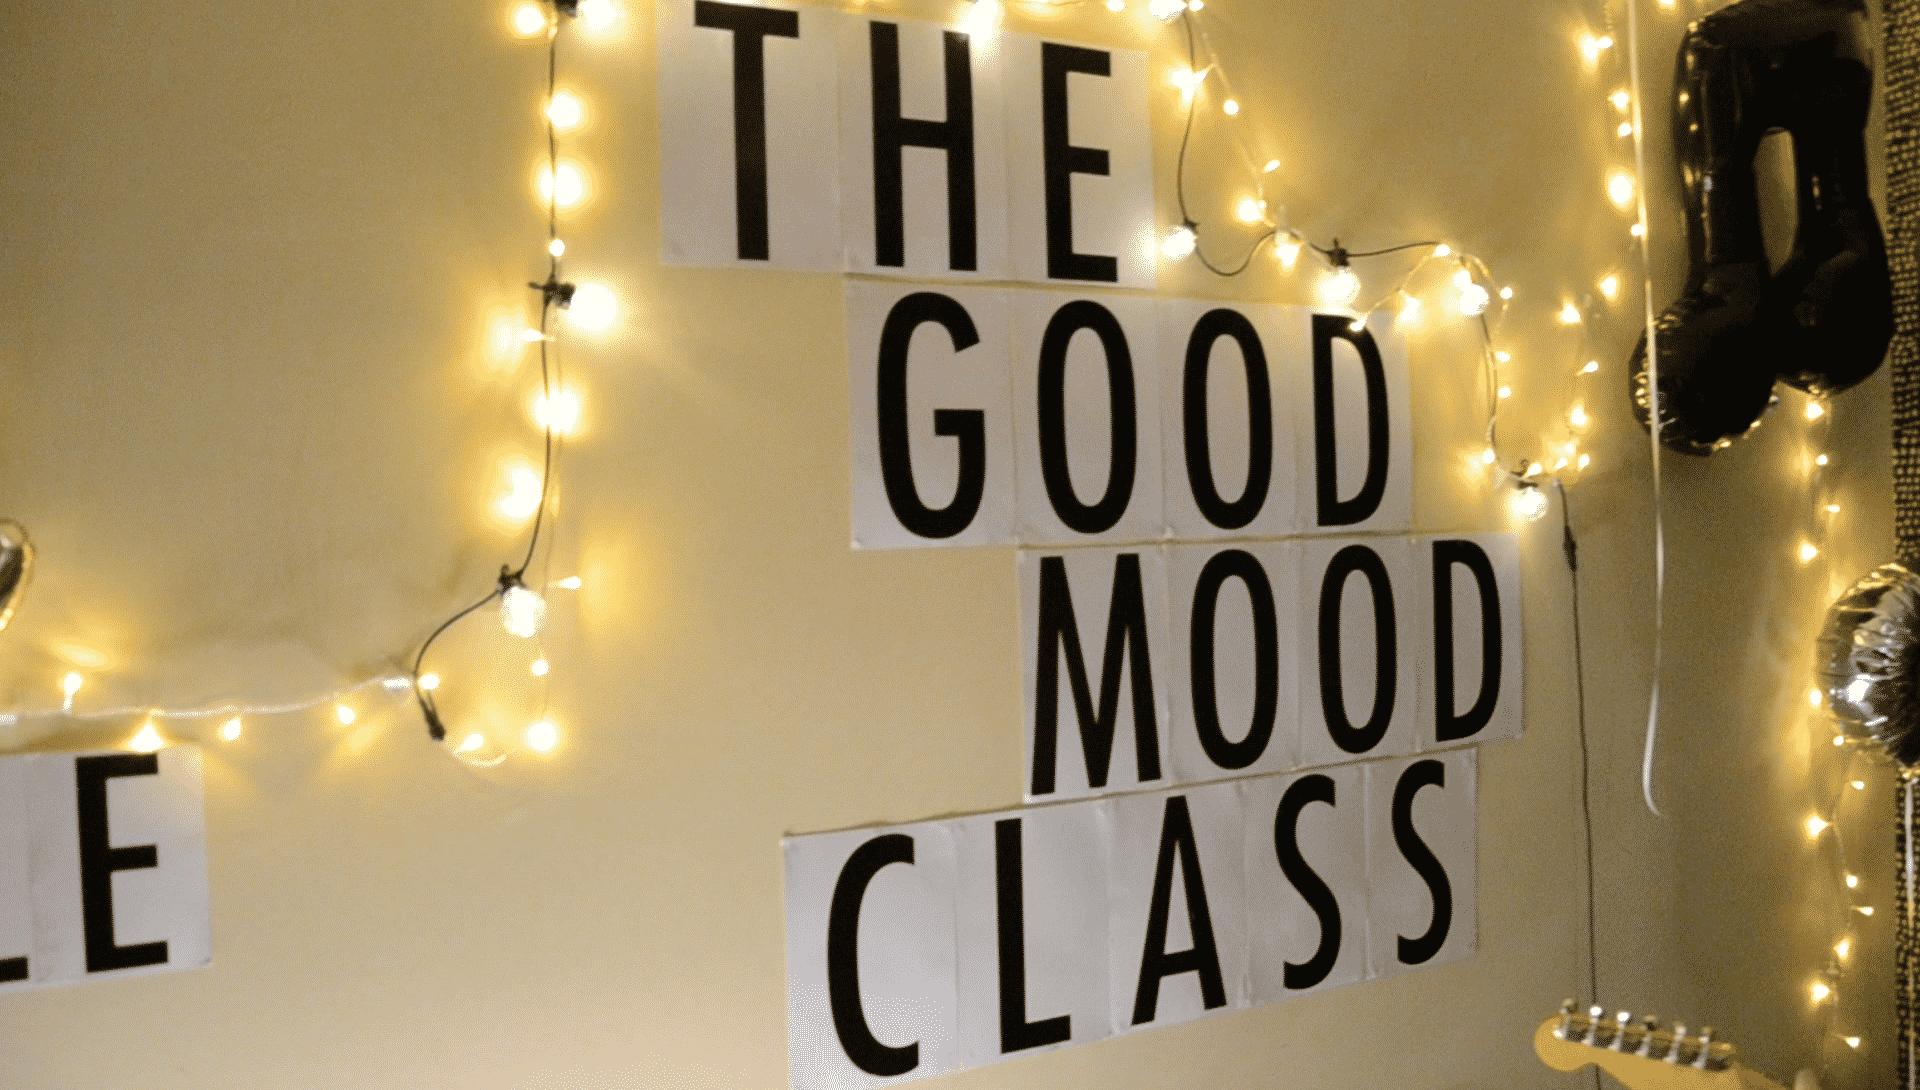 The Good Mood Class